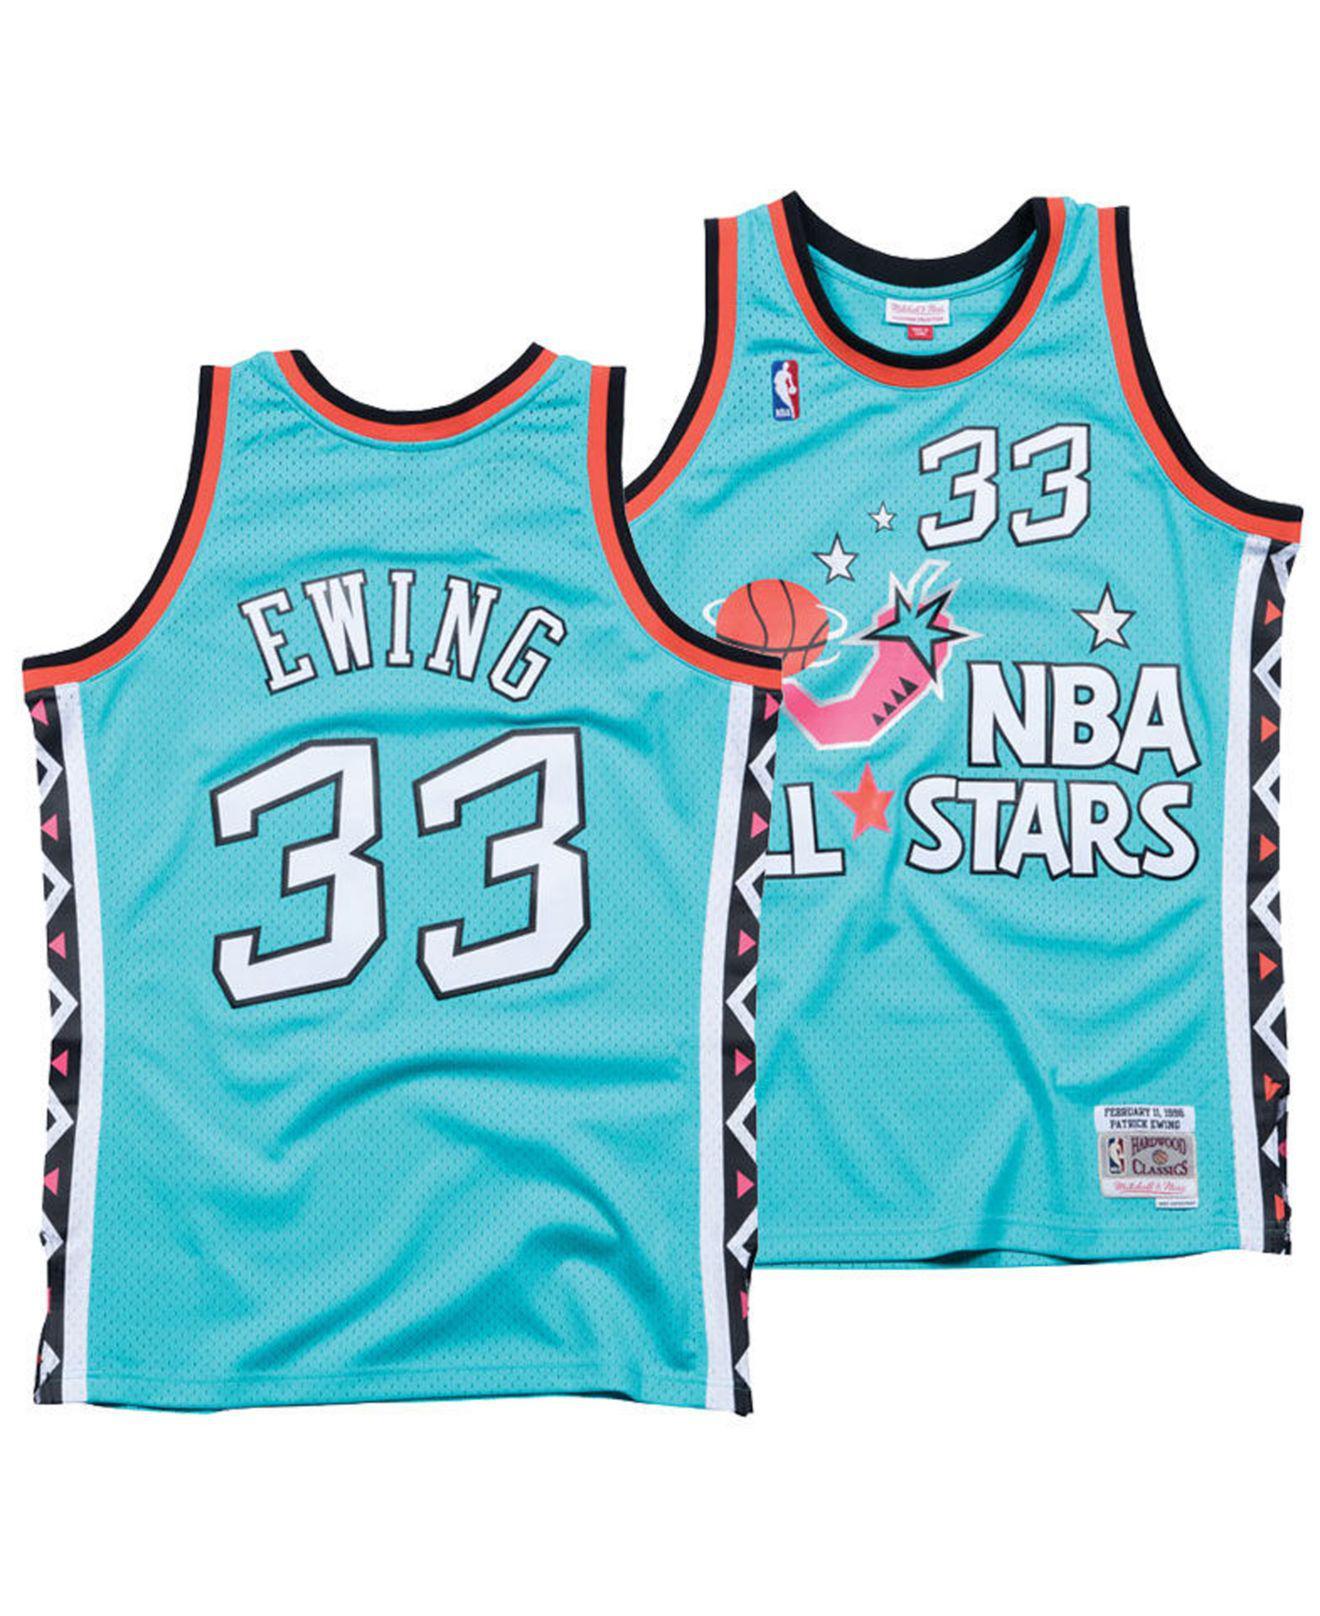 6bfc989b5 Mitchell   Ness. Men s Blue Patrick Ewing Nba All Star 1996 Swingman Jersey